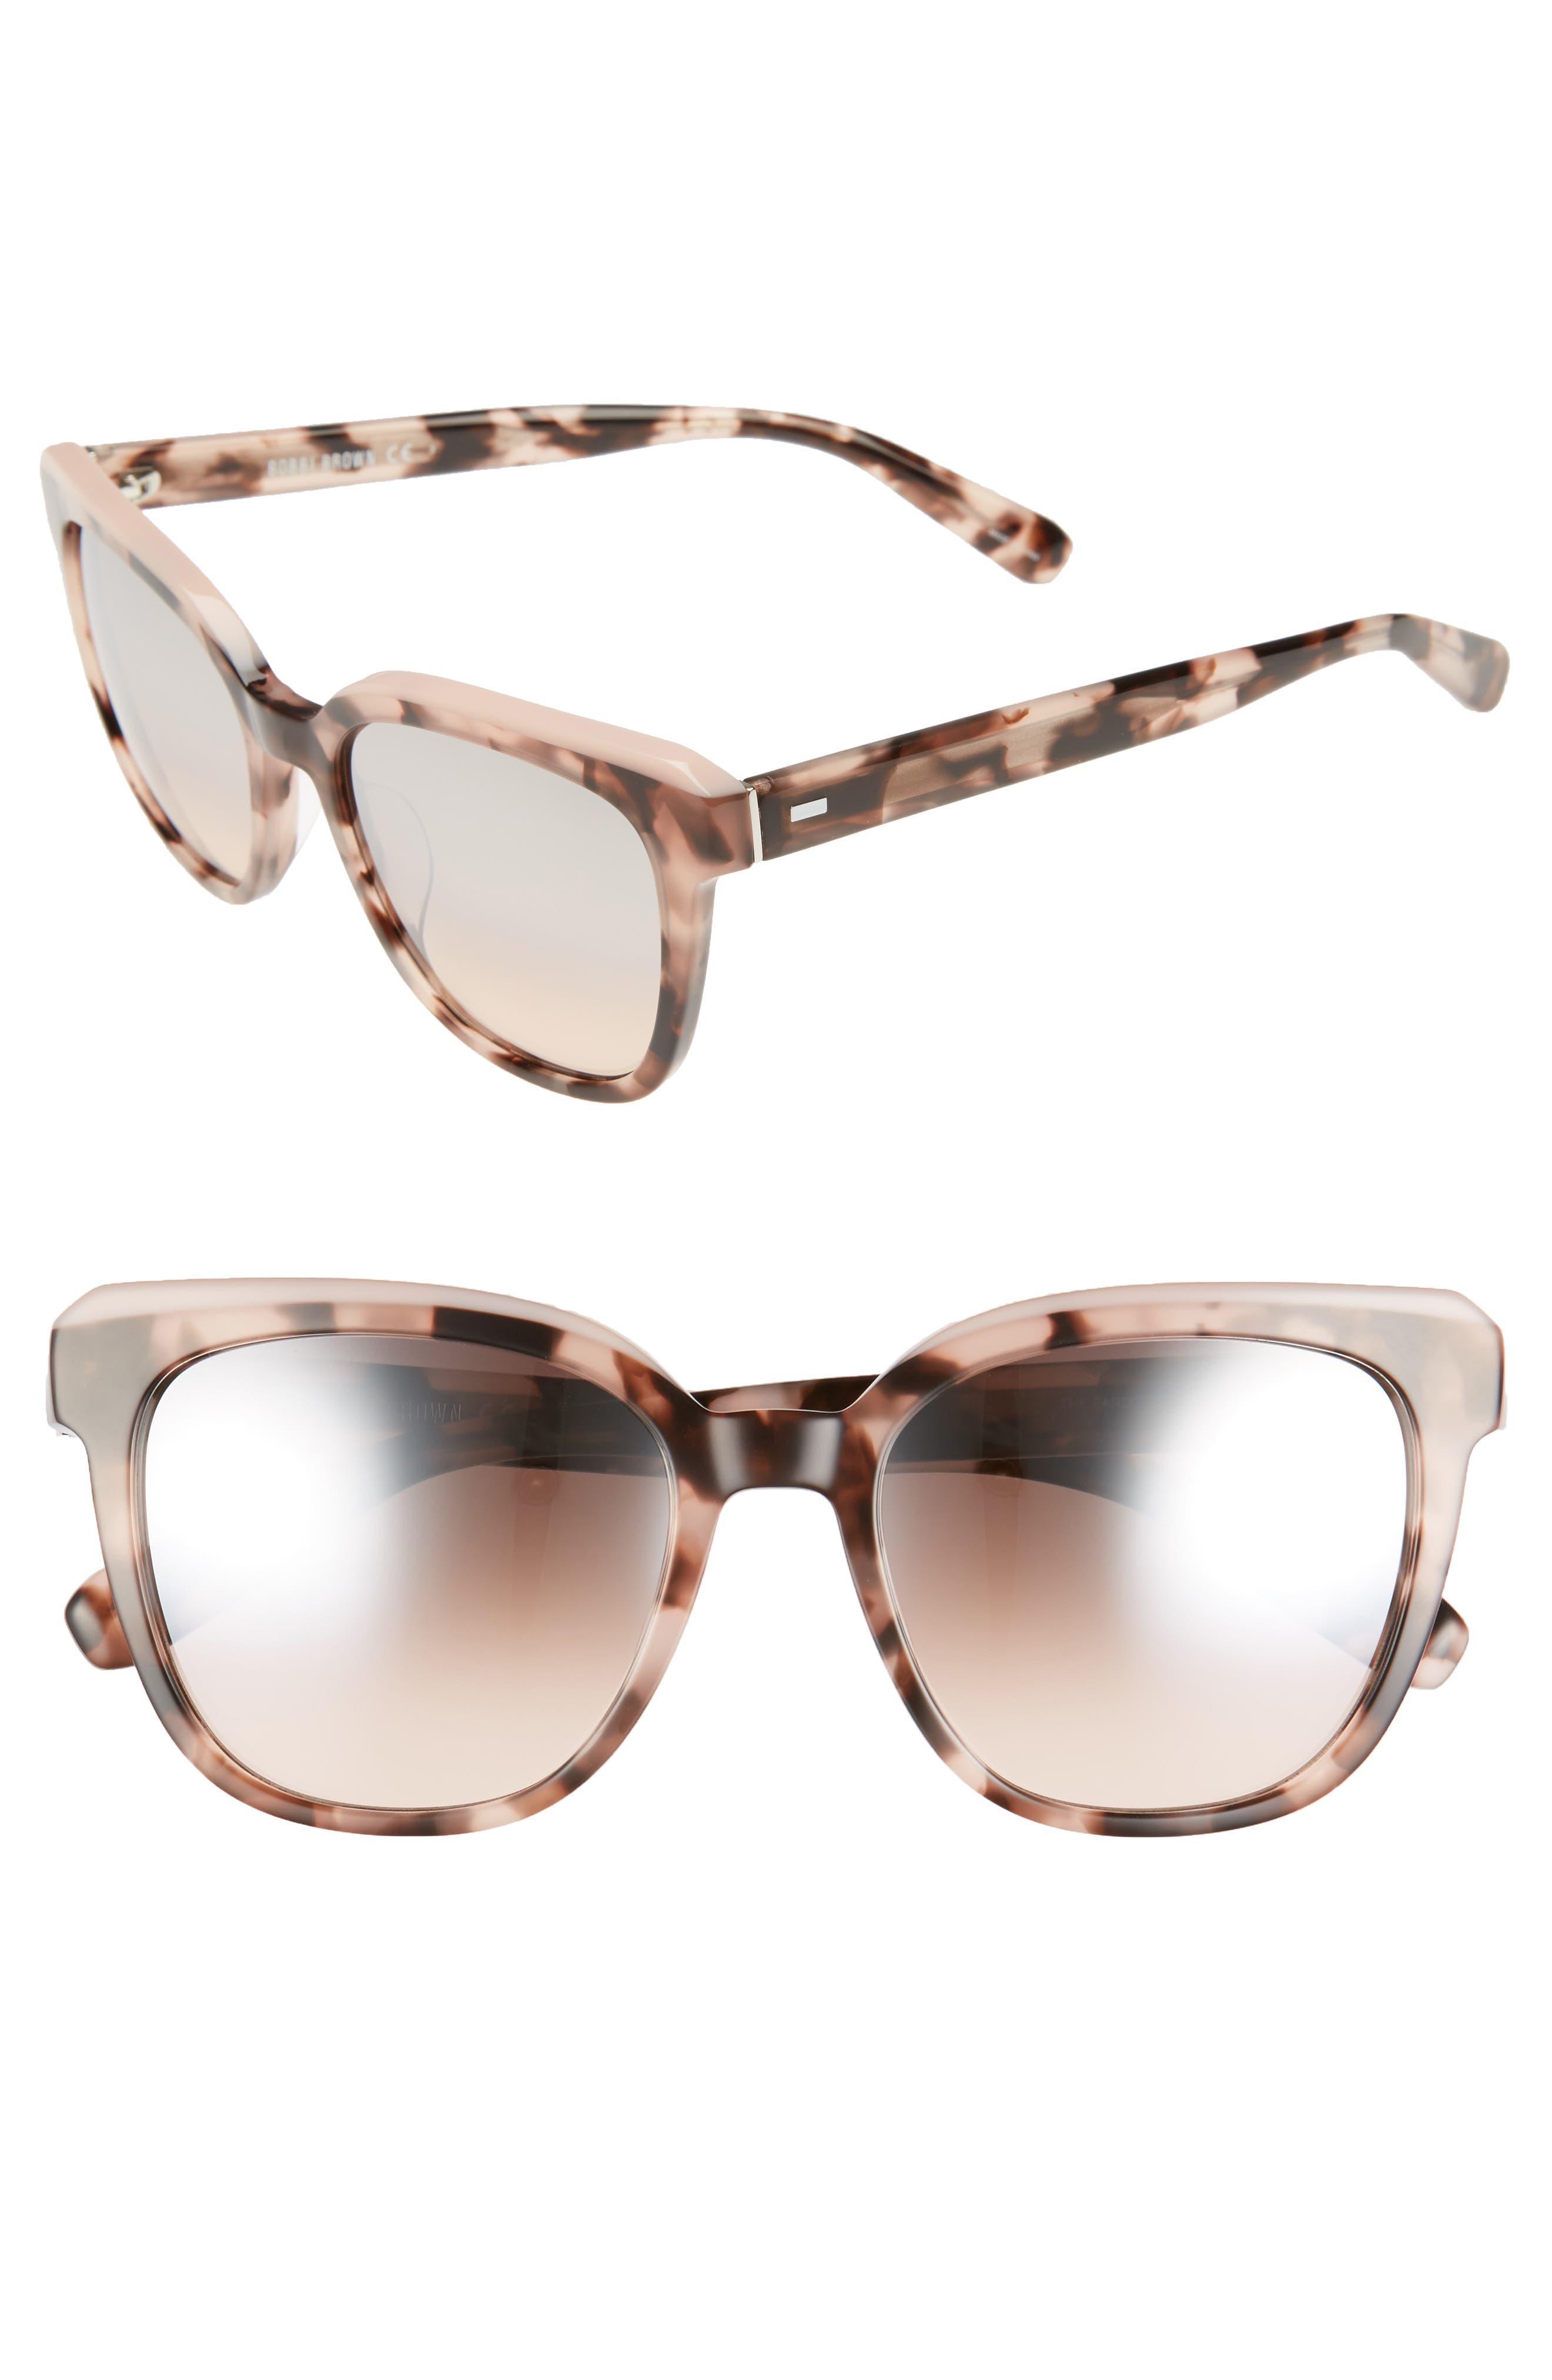 Alternate Image 1 Selected - Bobbi Brown The Bardot 53mm Gradient Sunglasses